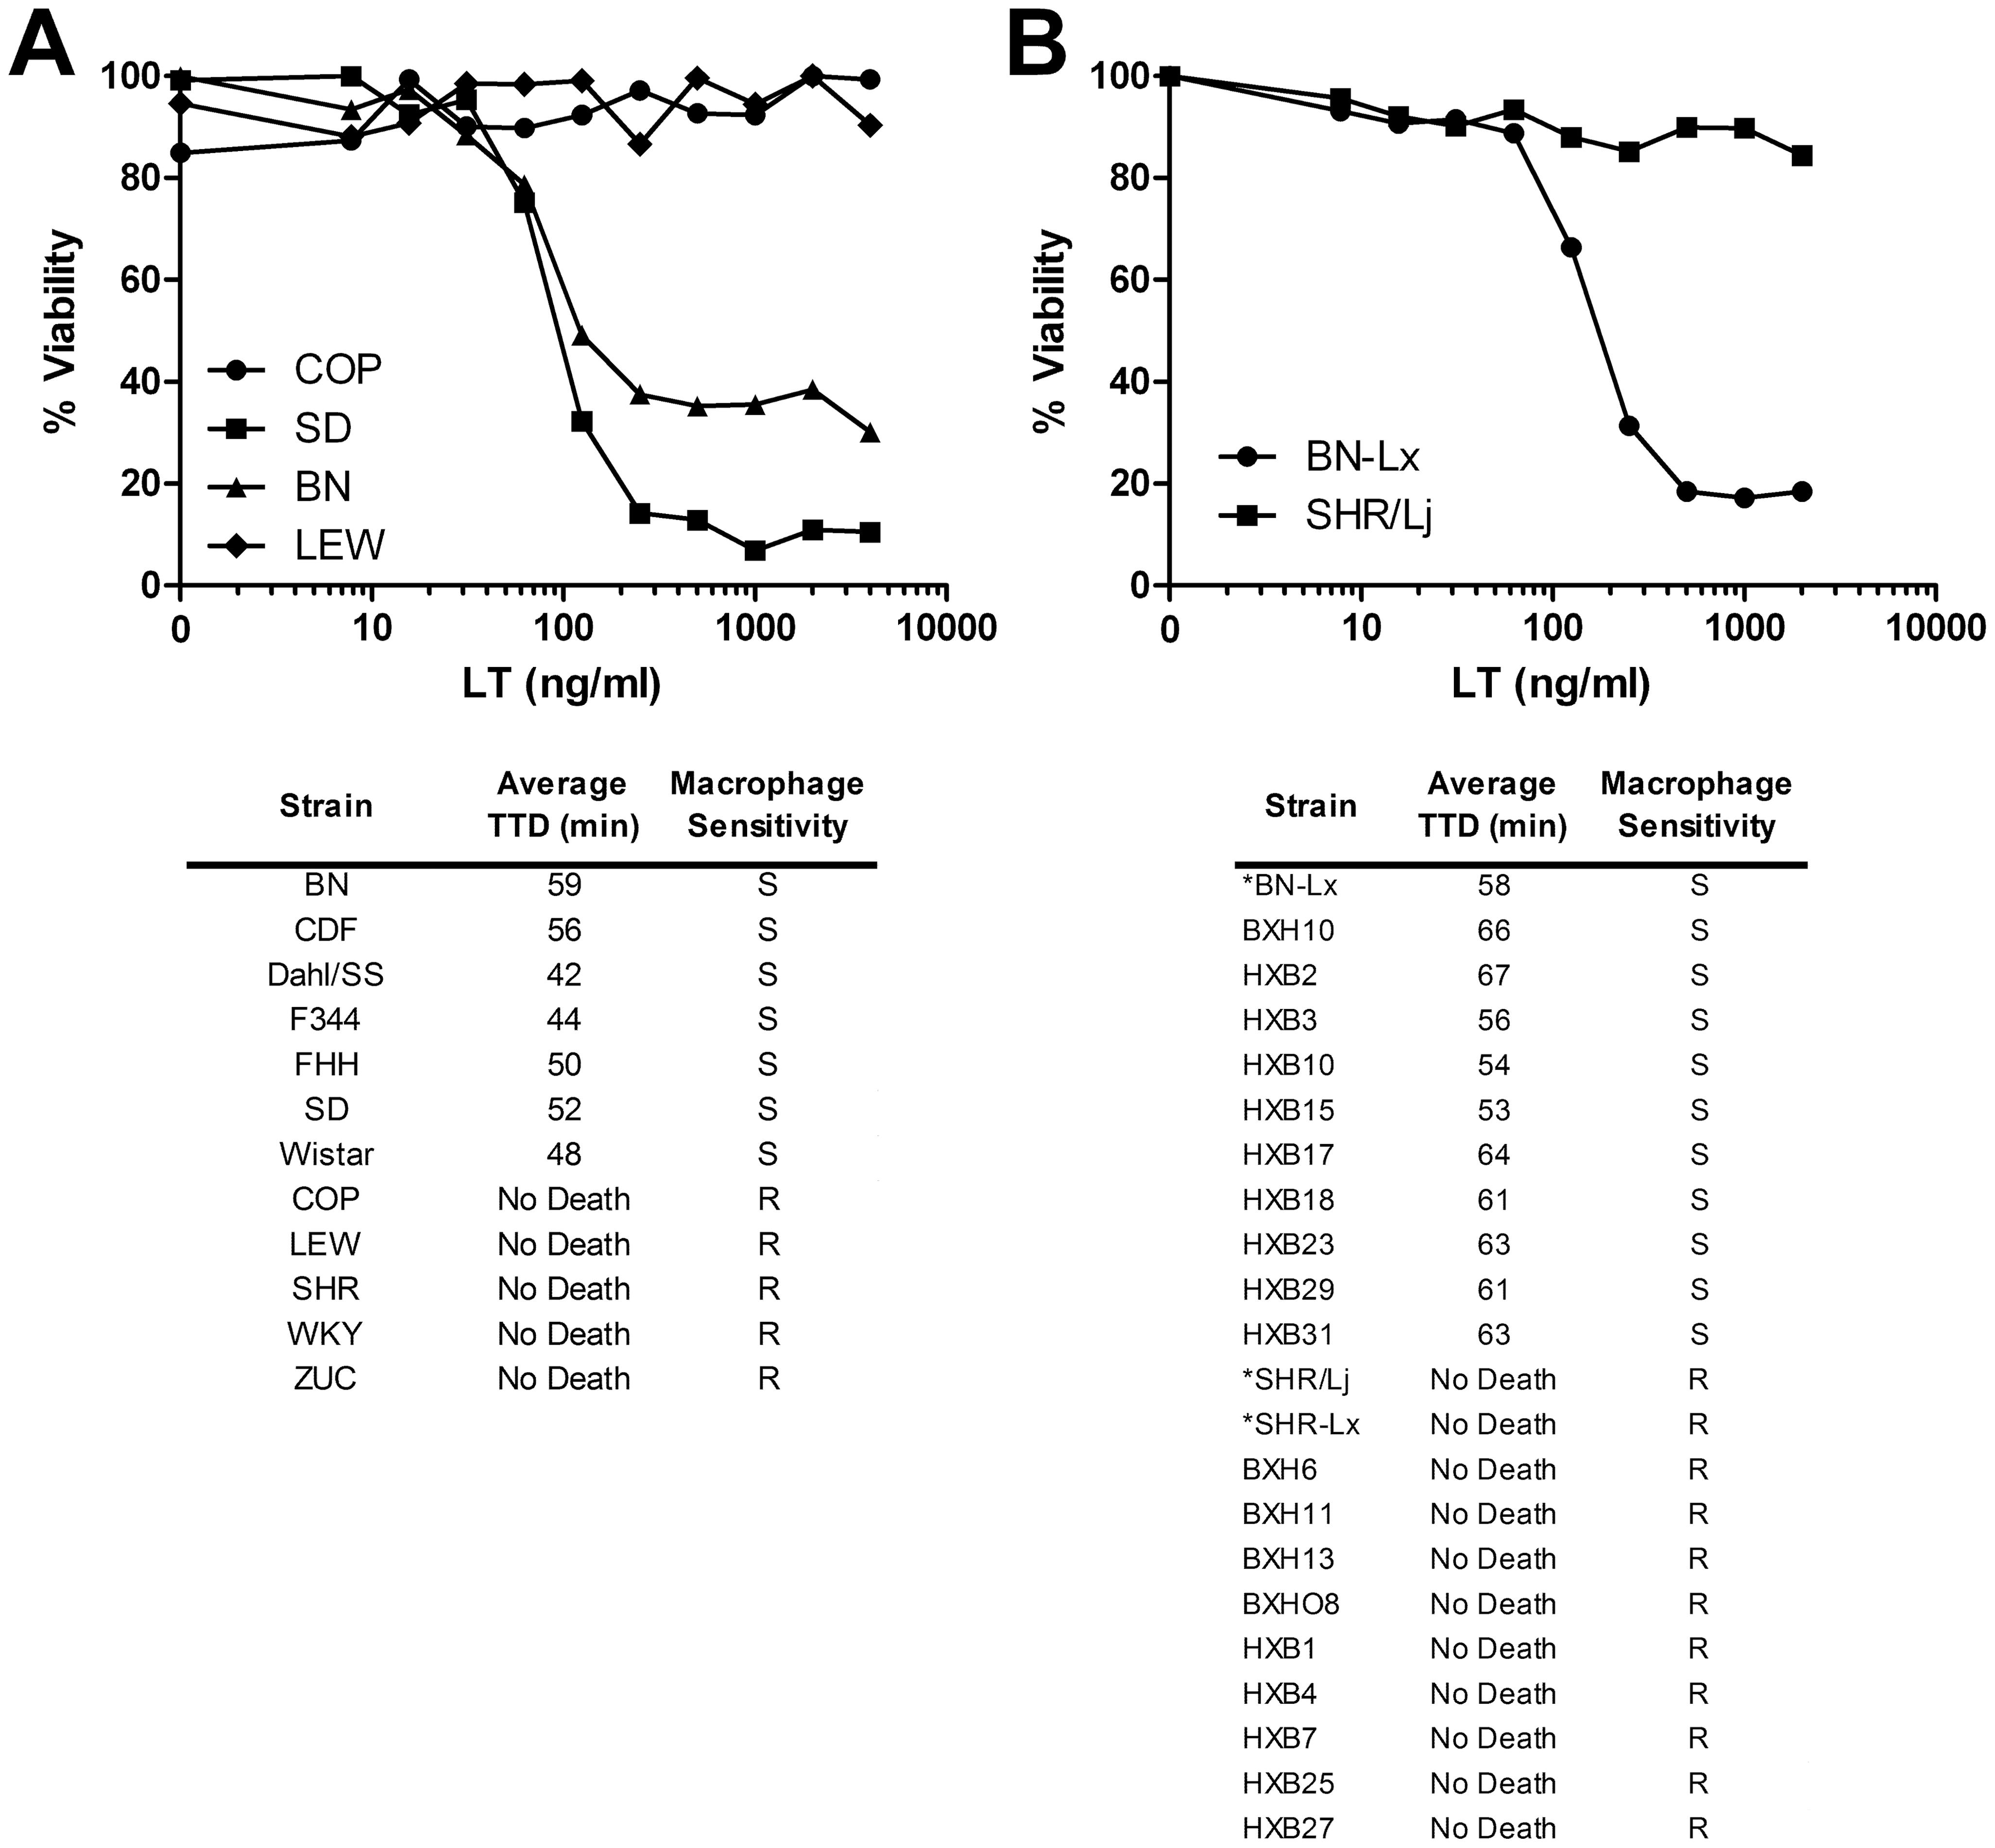 LT sensitivity in rat strains correlates perfectly with macrophage sensitivity.